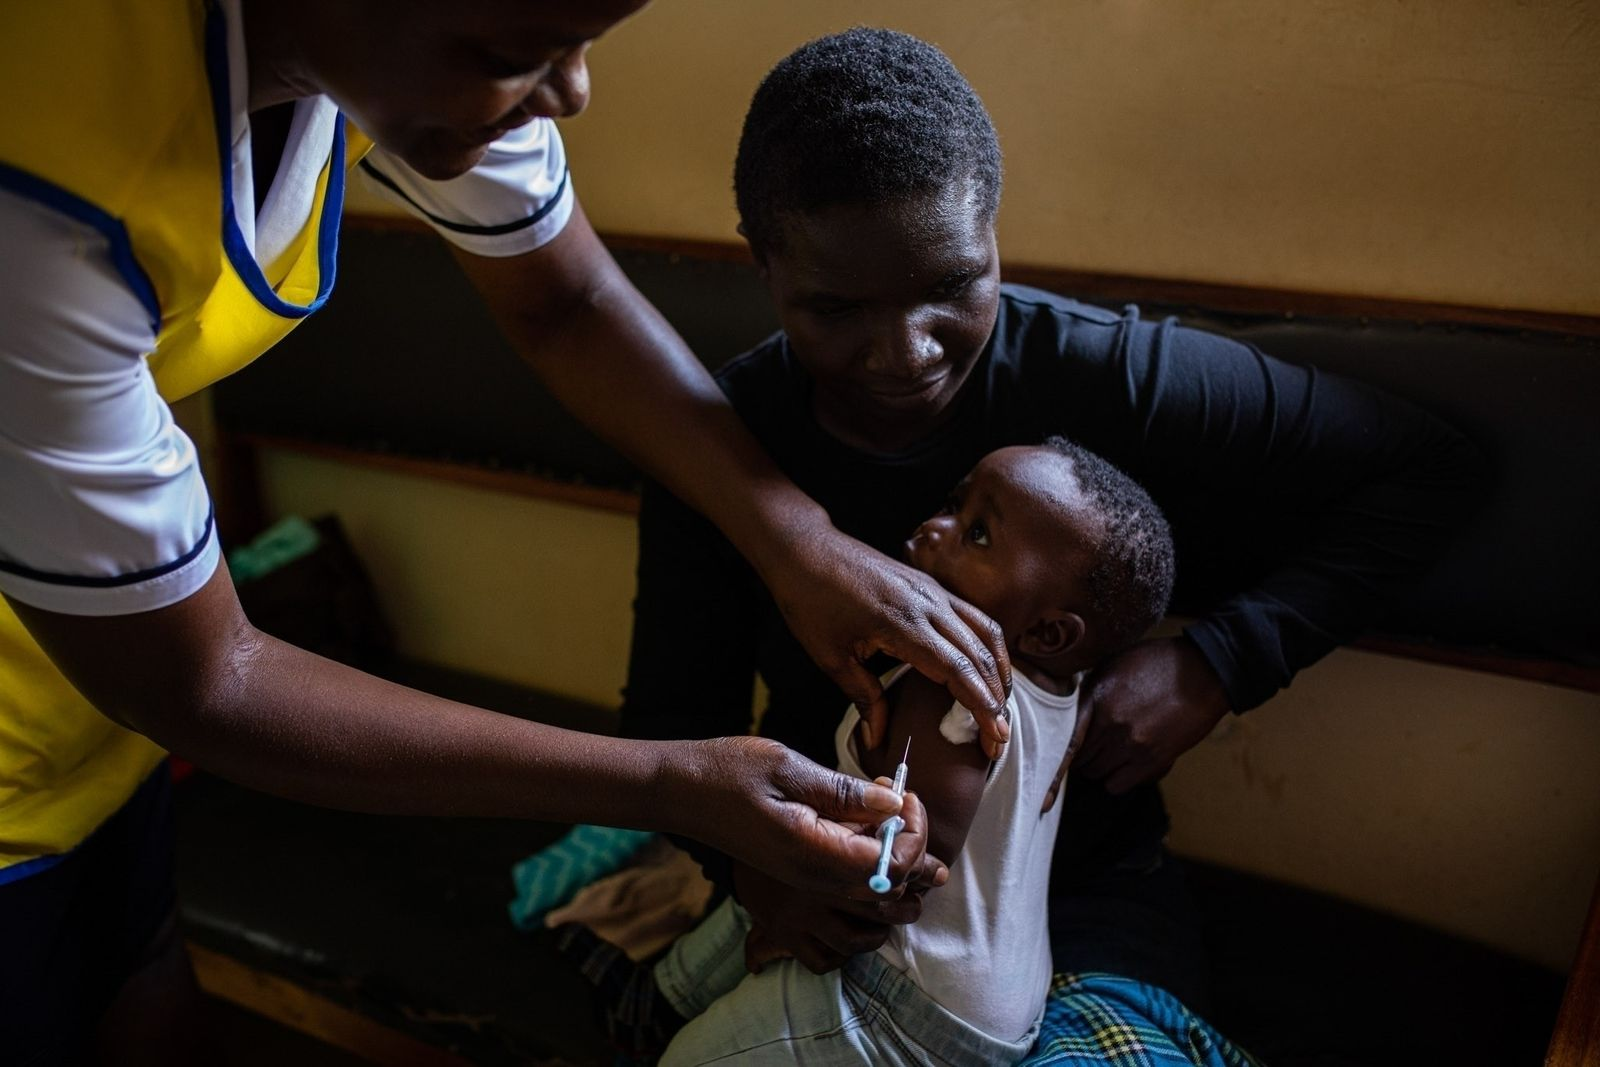 Bebé recibe la vacuna contra la malaria